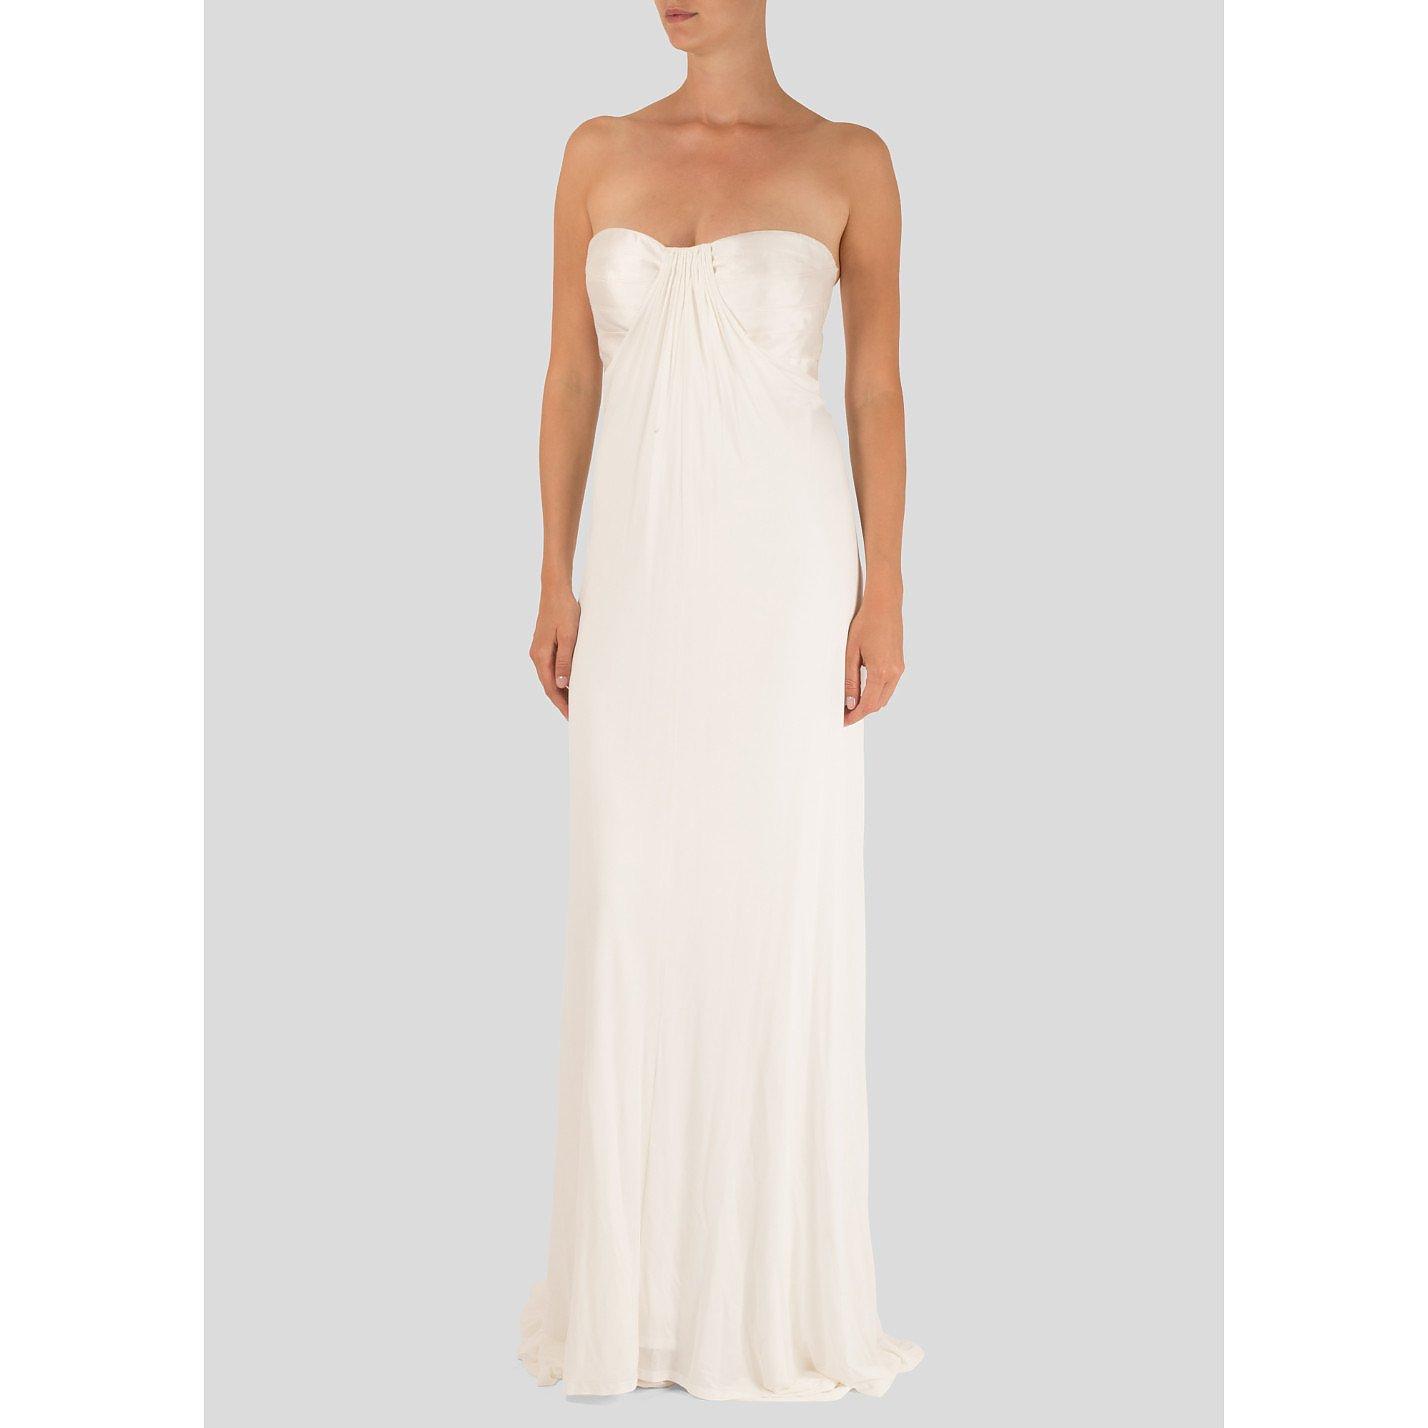 Amanda Wakeley Bridal The Afina Bridal Dress